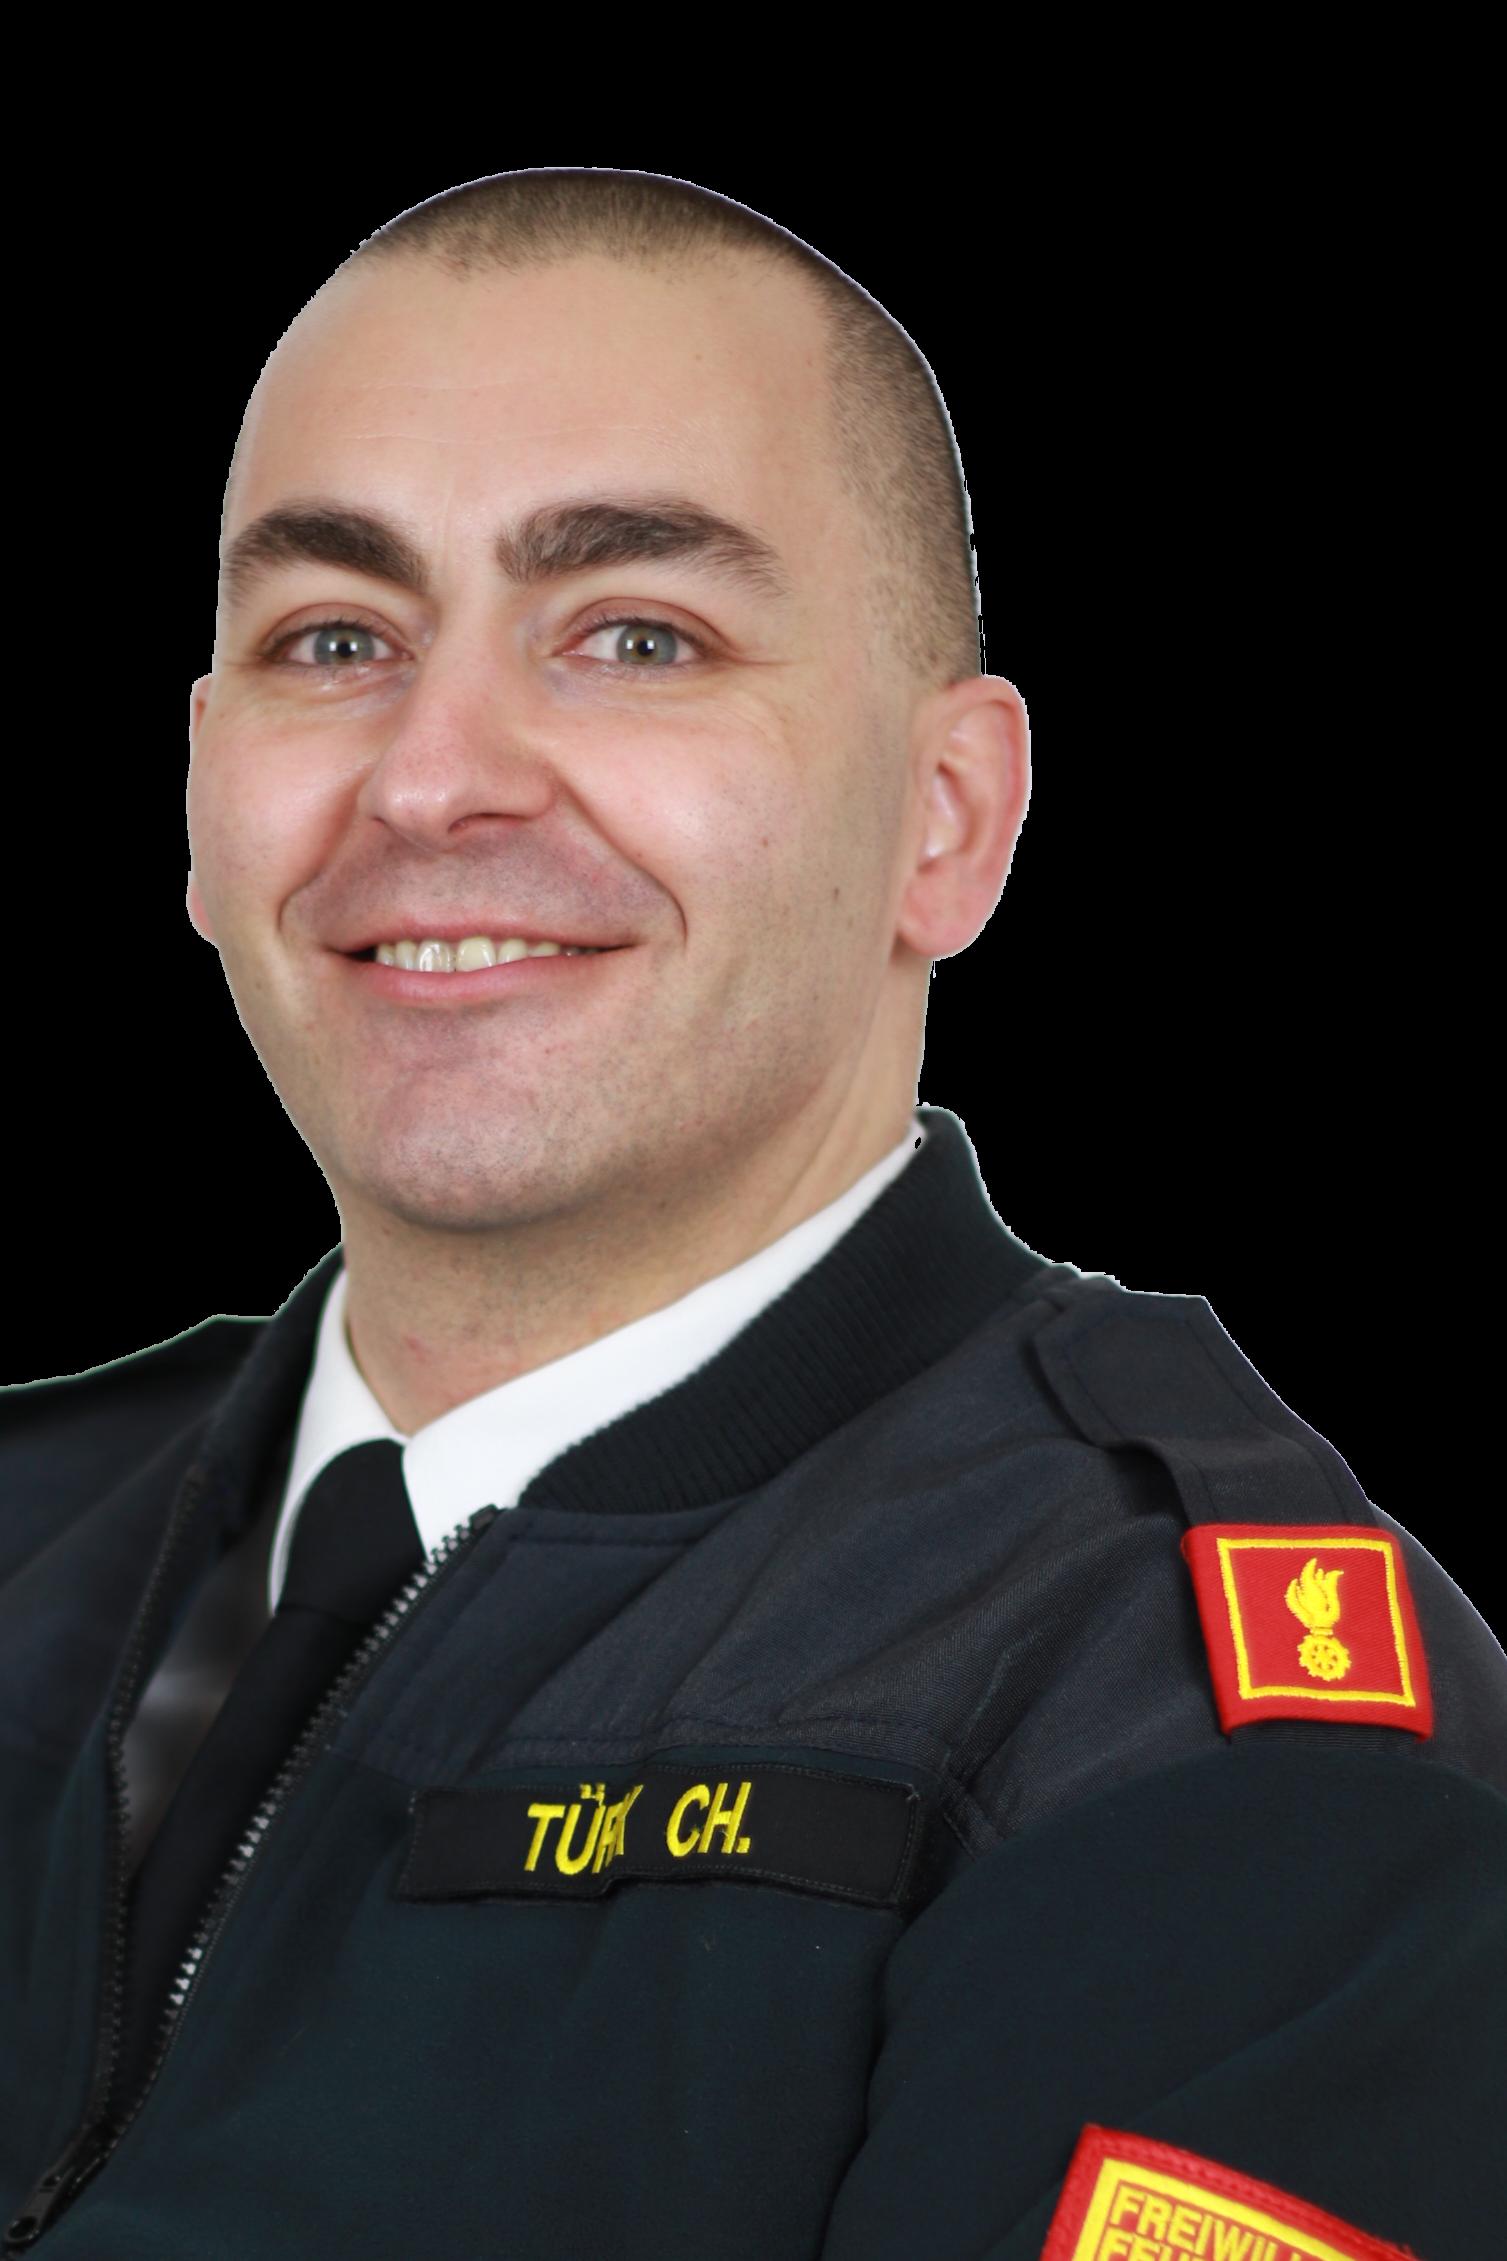 Christian TÜRK